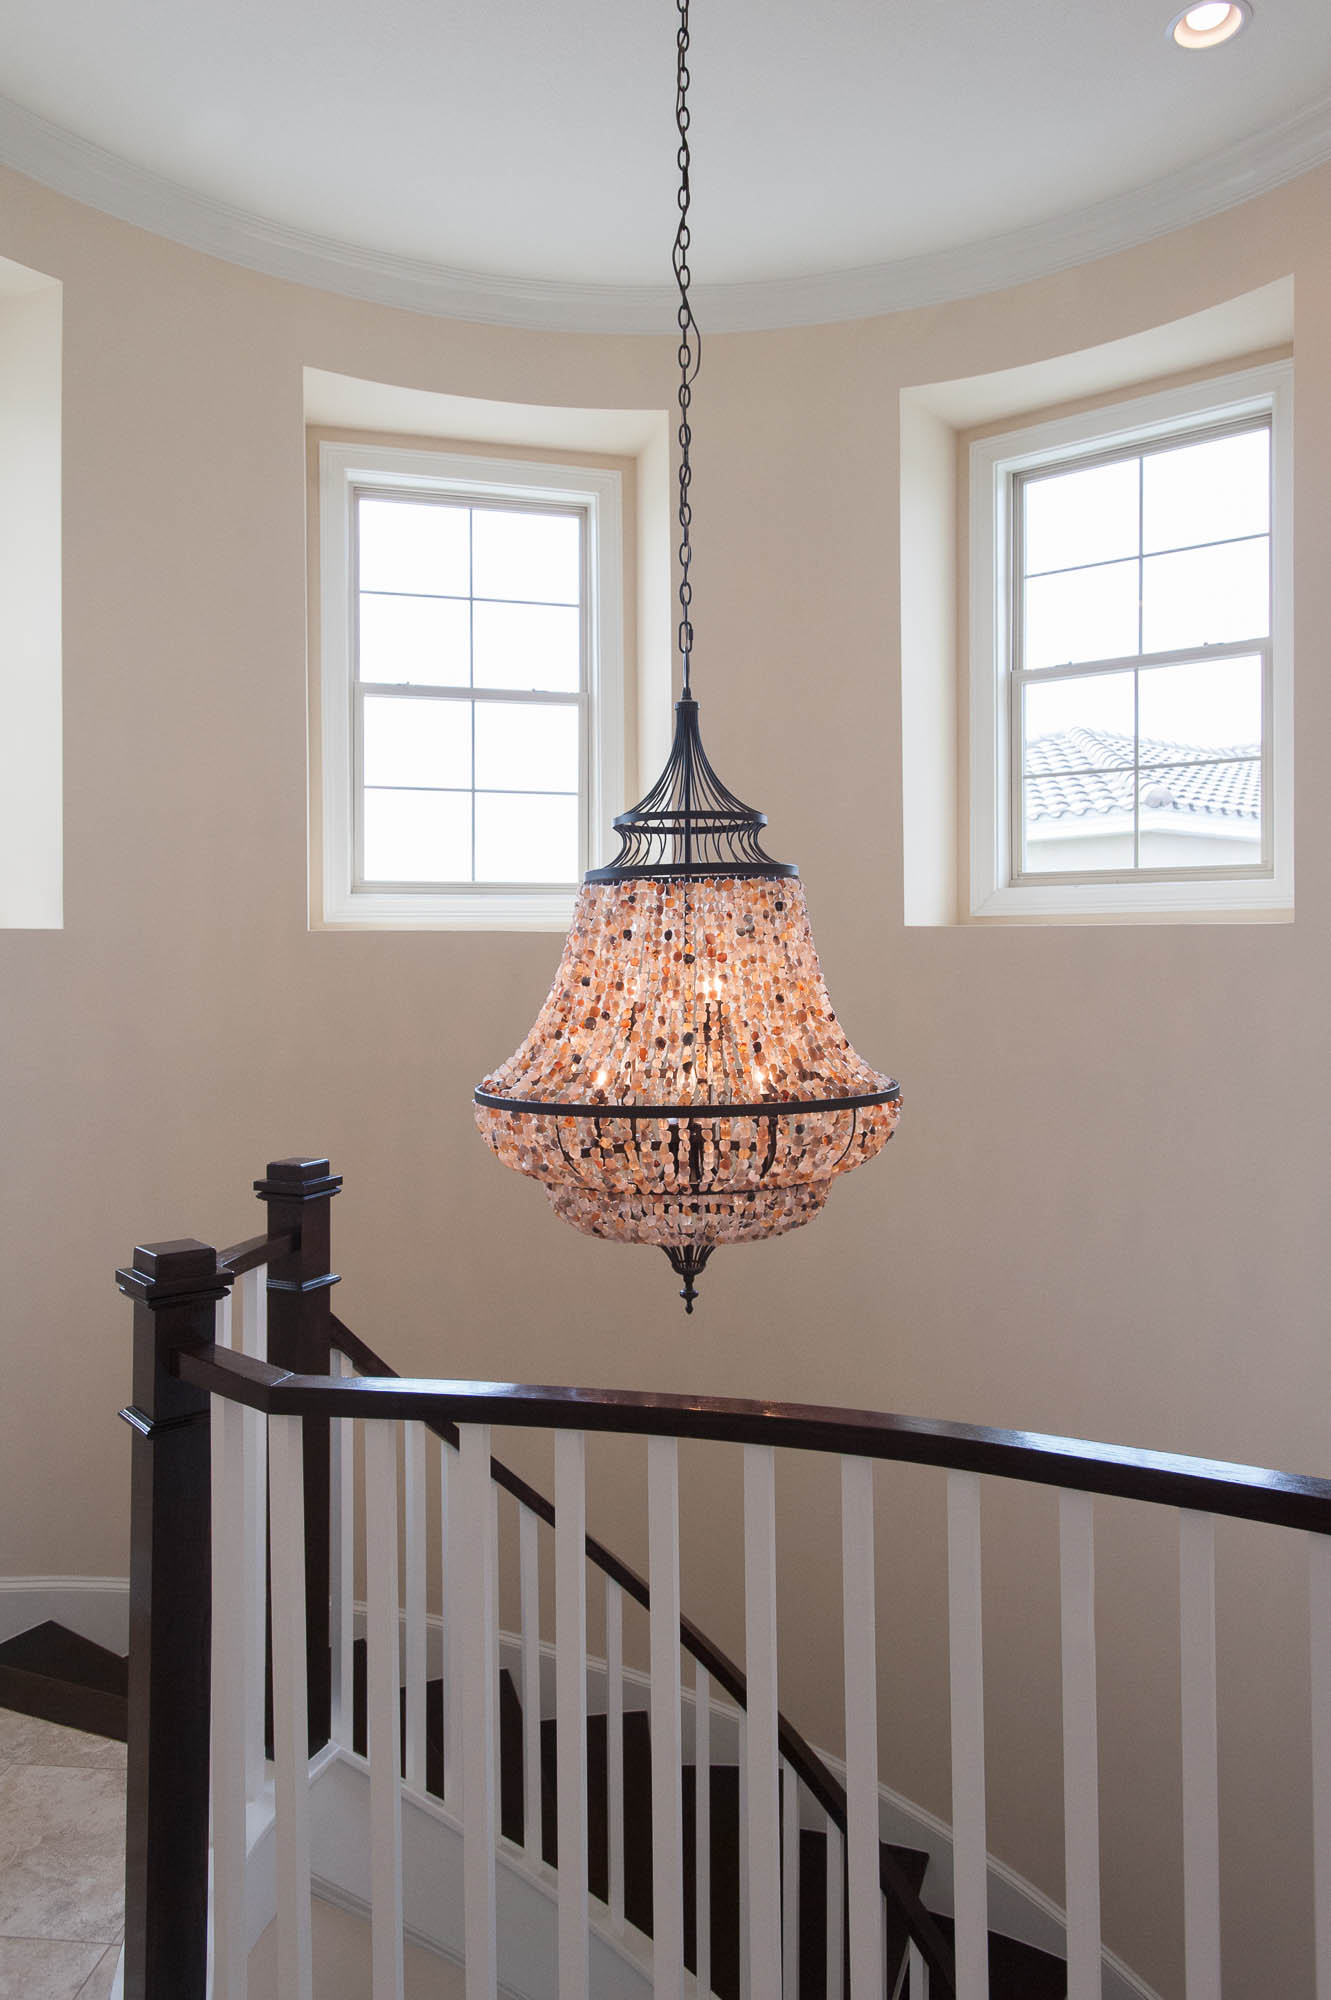 sterling-lennar-celestina-st johns-florida-nefba-northeast florida-southeastern united states-residential interior design-contemporary-staircase-spiral staircase-millwork-chandelier.jpg